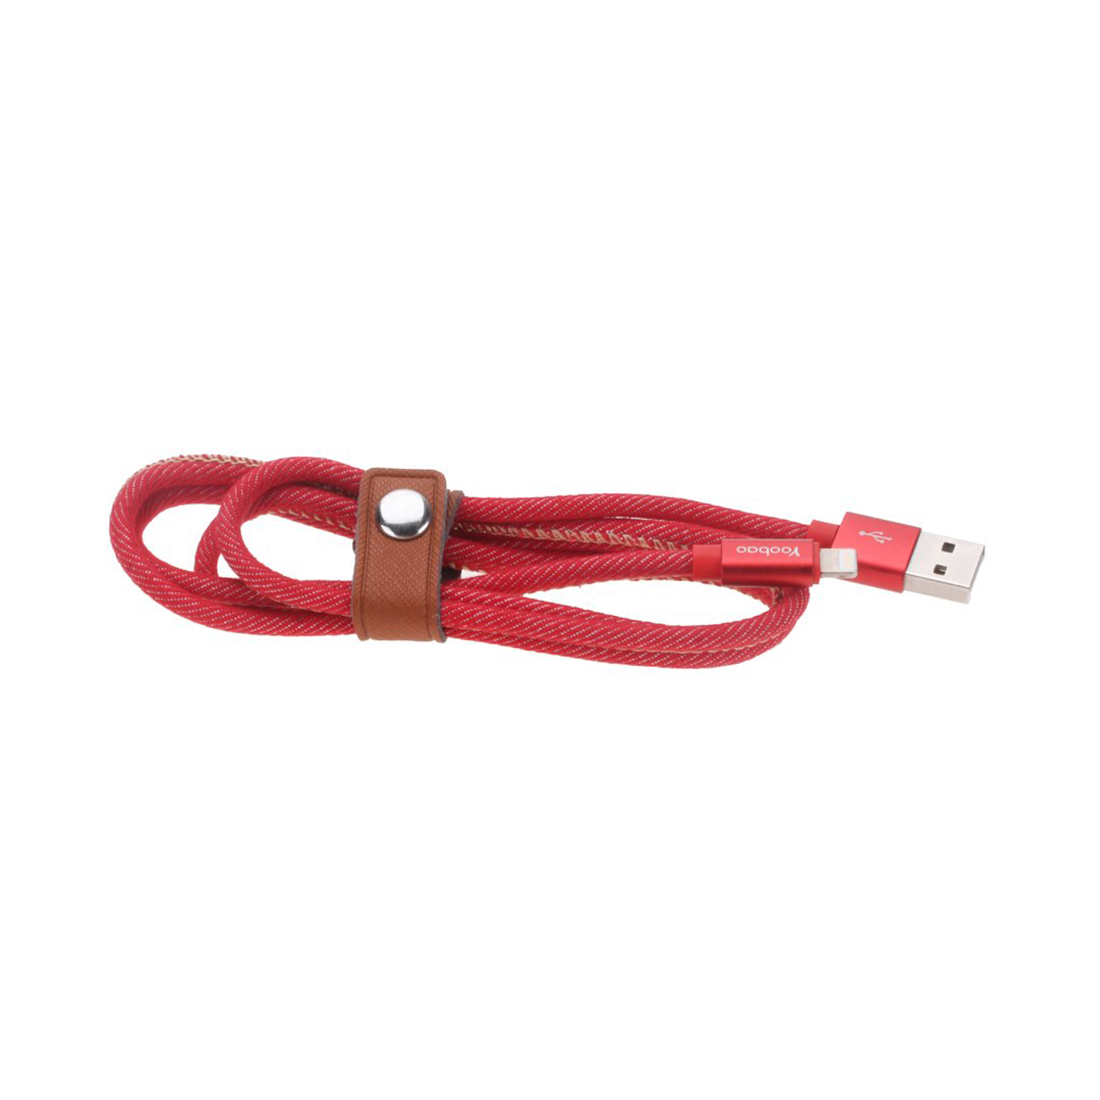 Интерфейсный кабель Yoobao YB-427 Red  Lightning